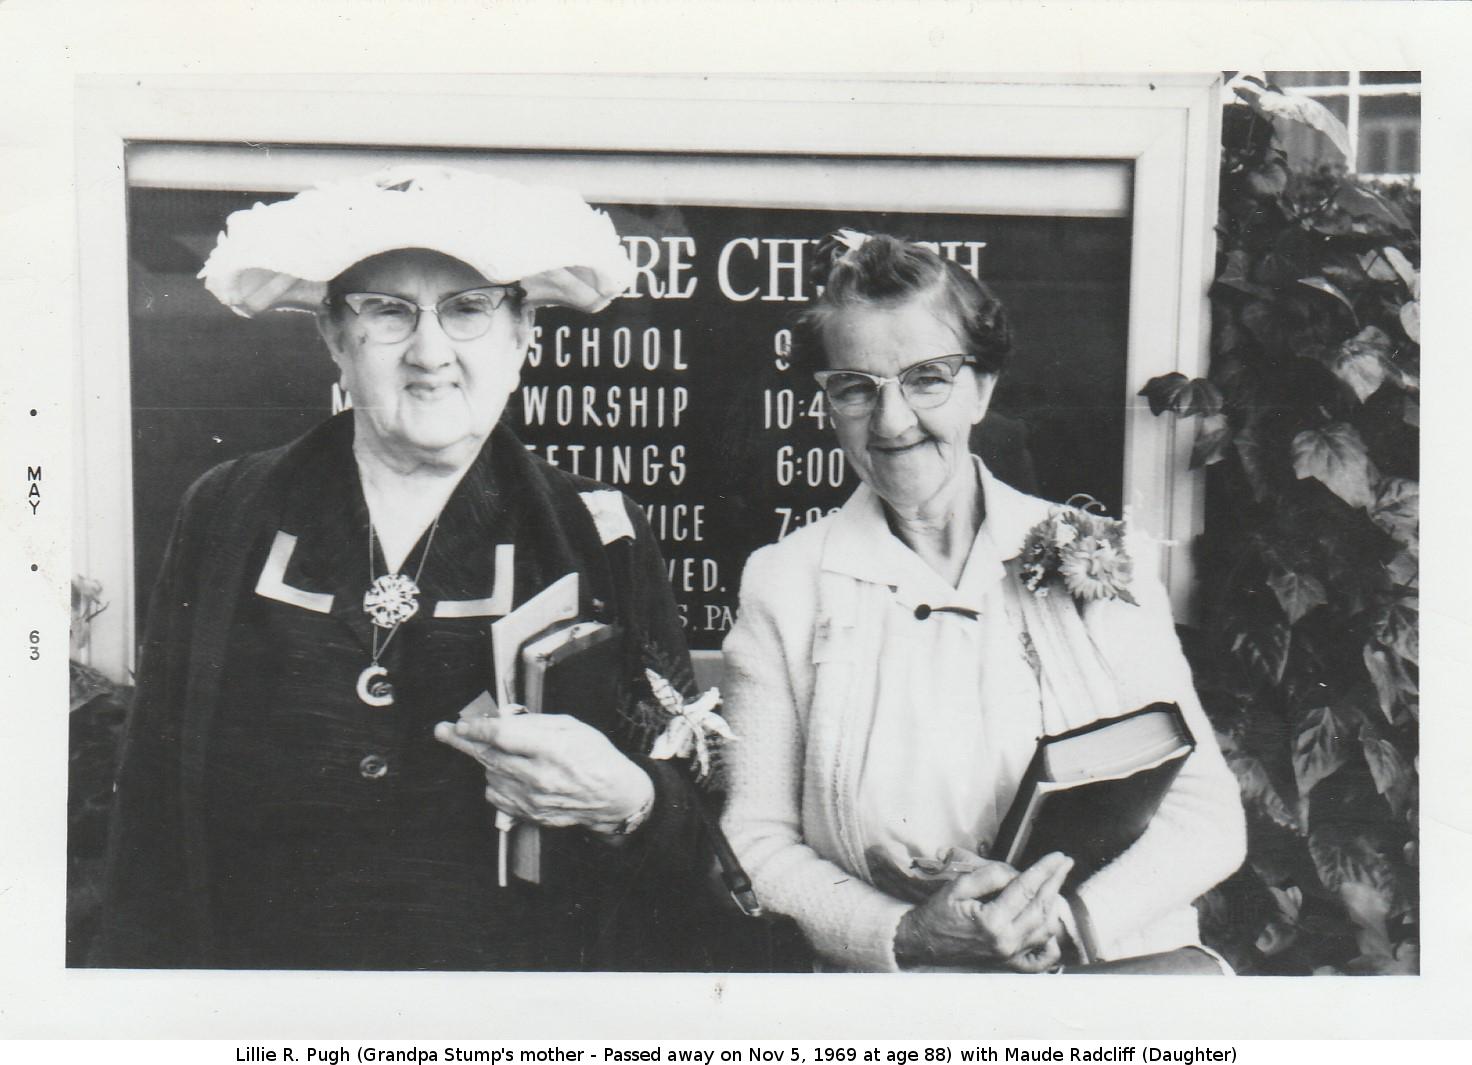 Lillie R Pugh and Maude Radcliff